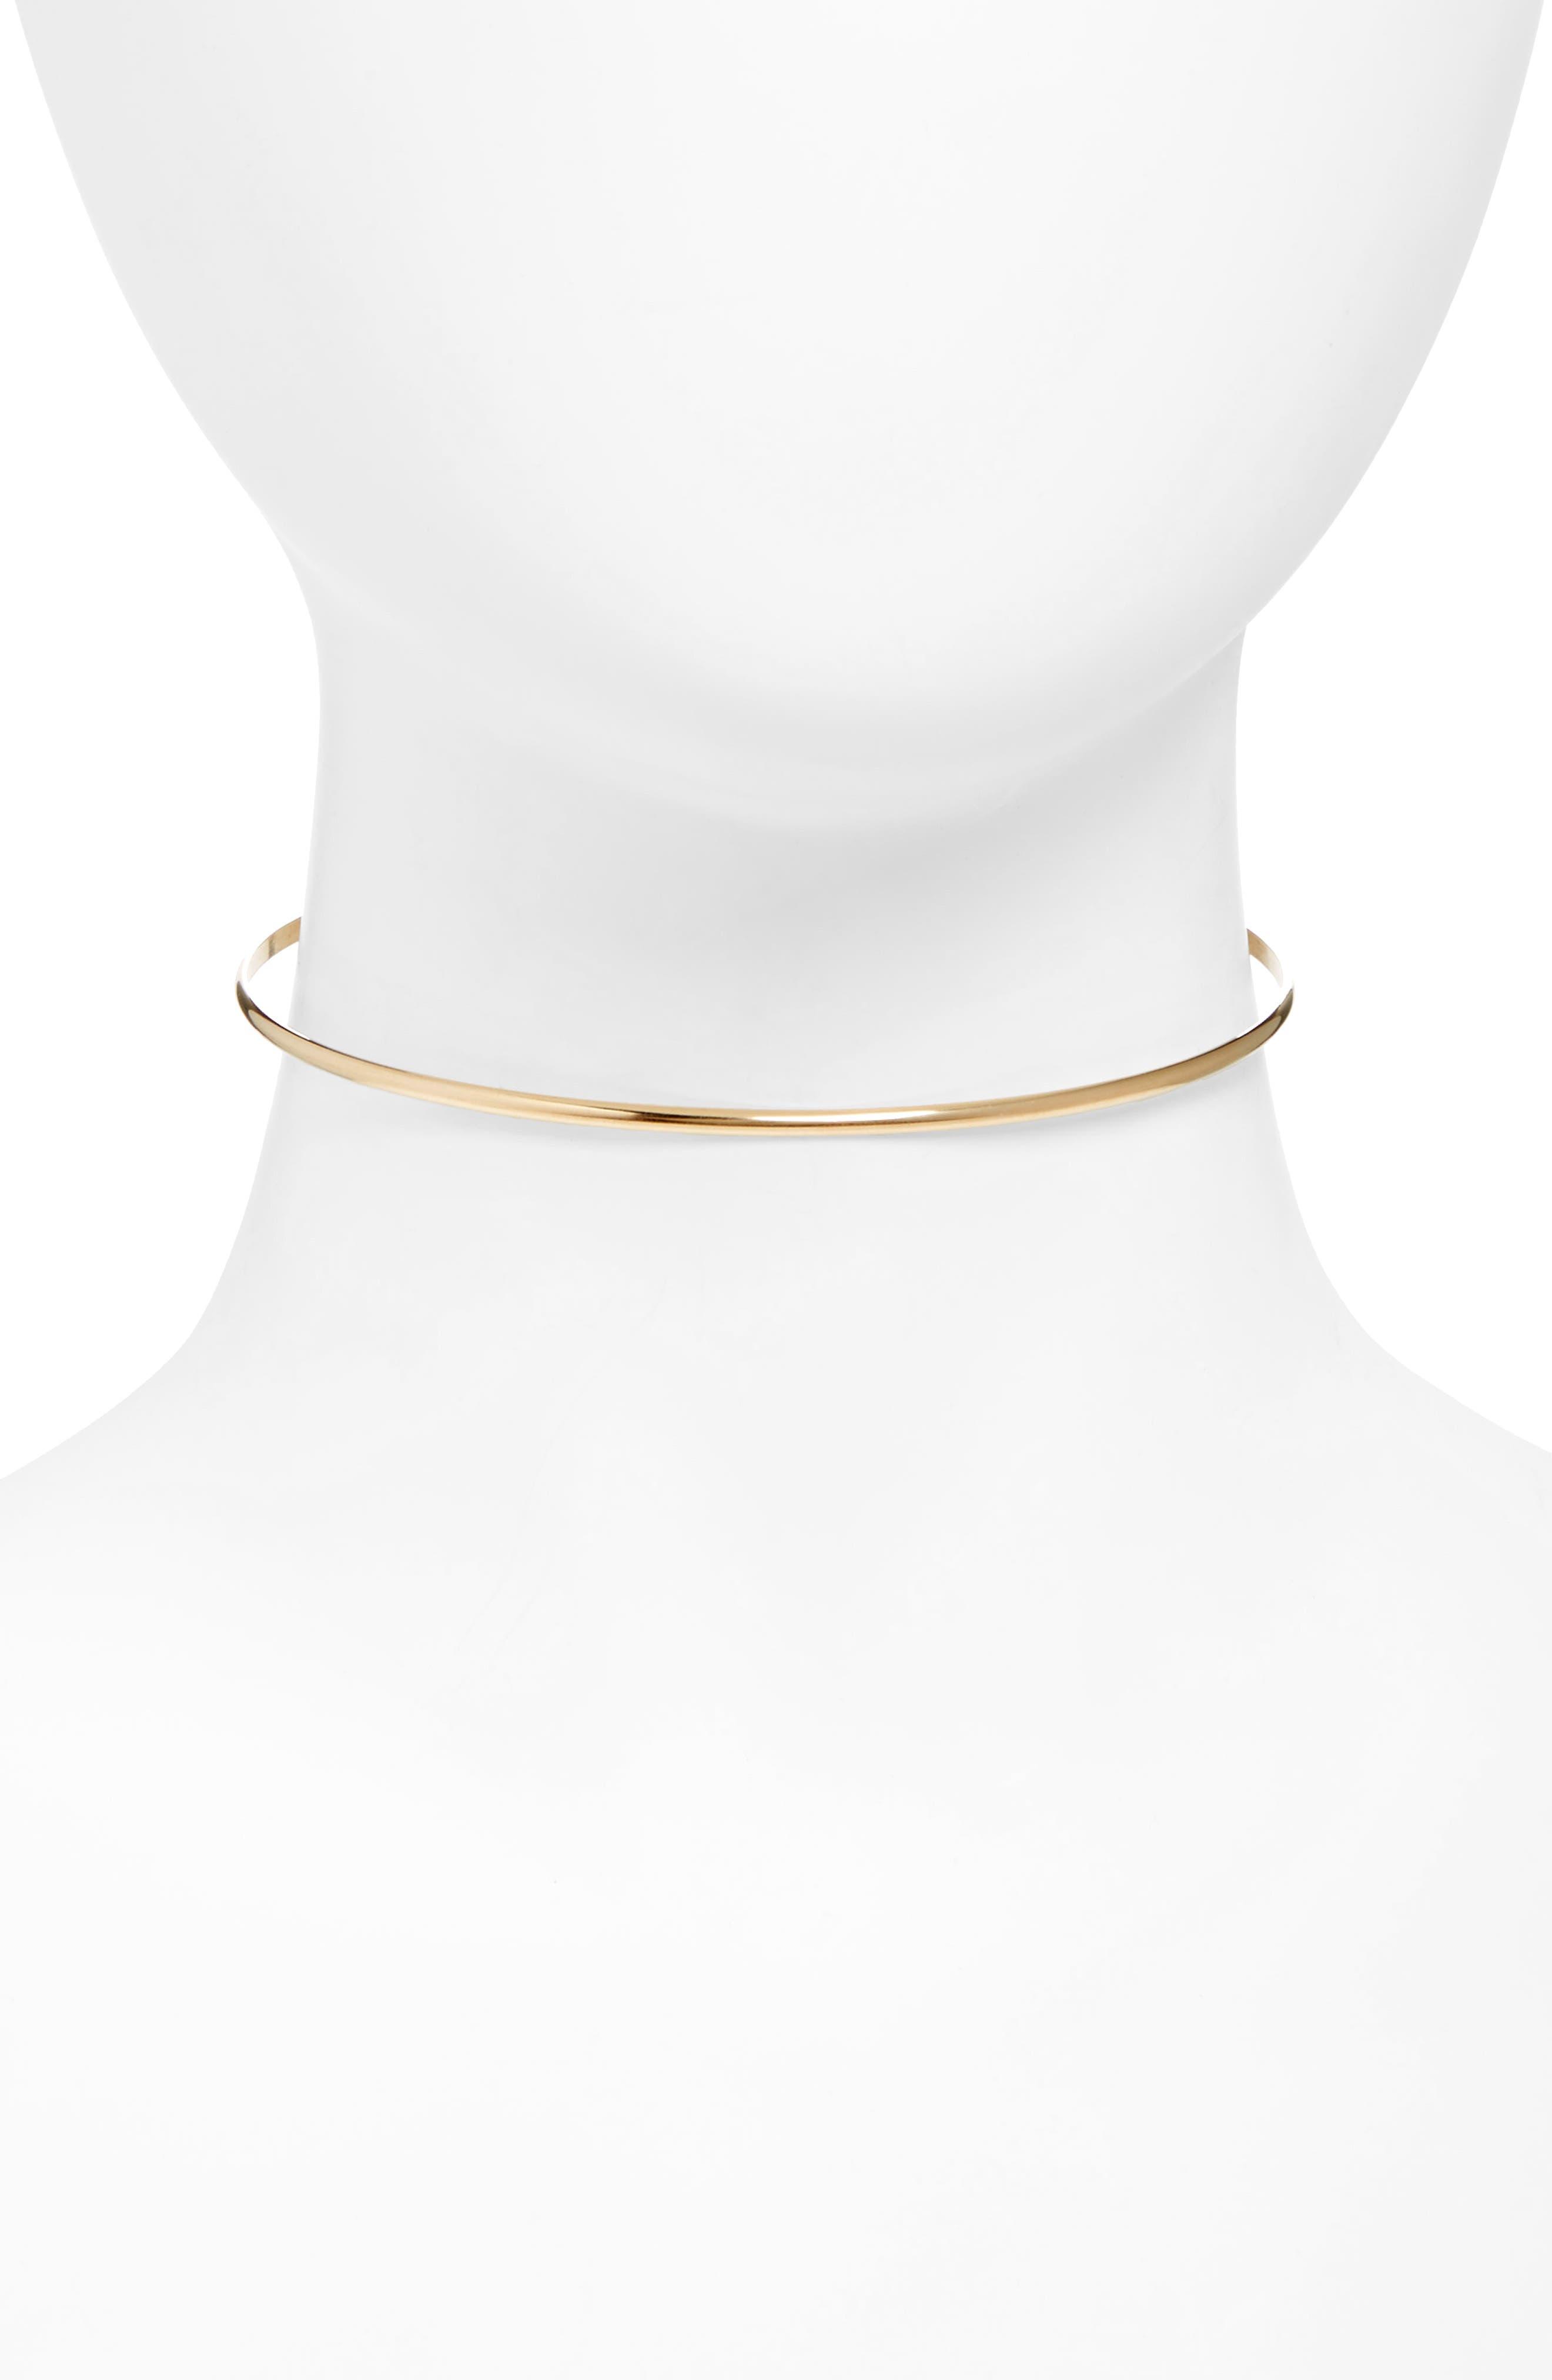 Sydney Thin Choker,                         Main,                         color, Gold